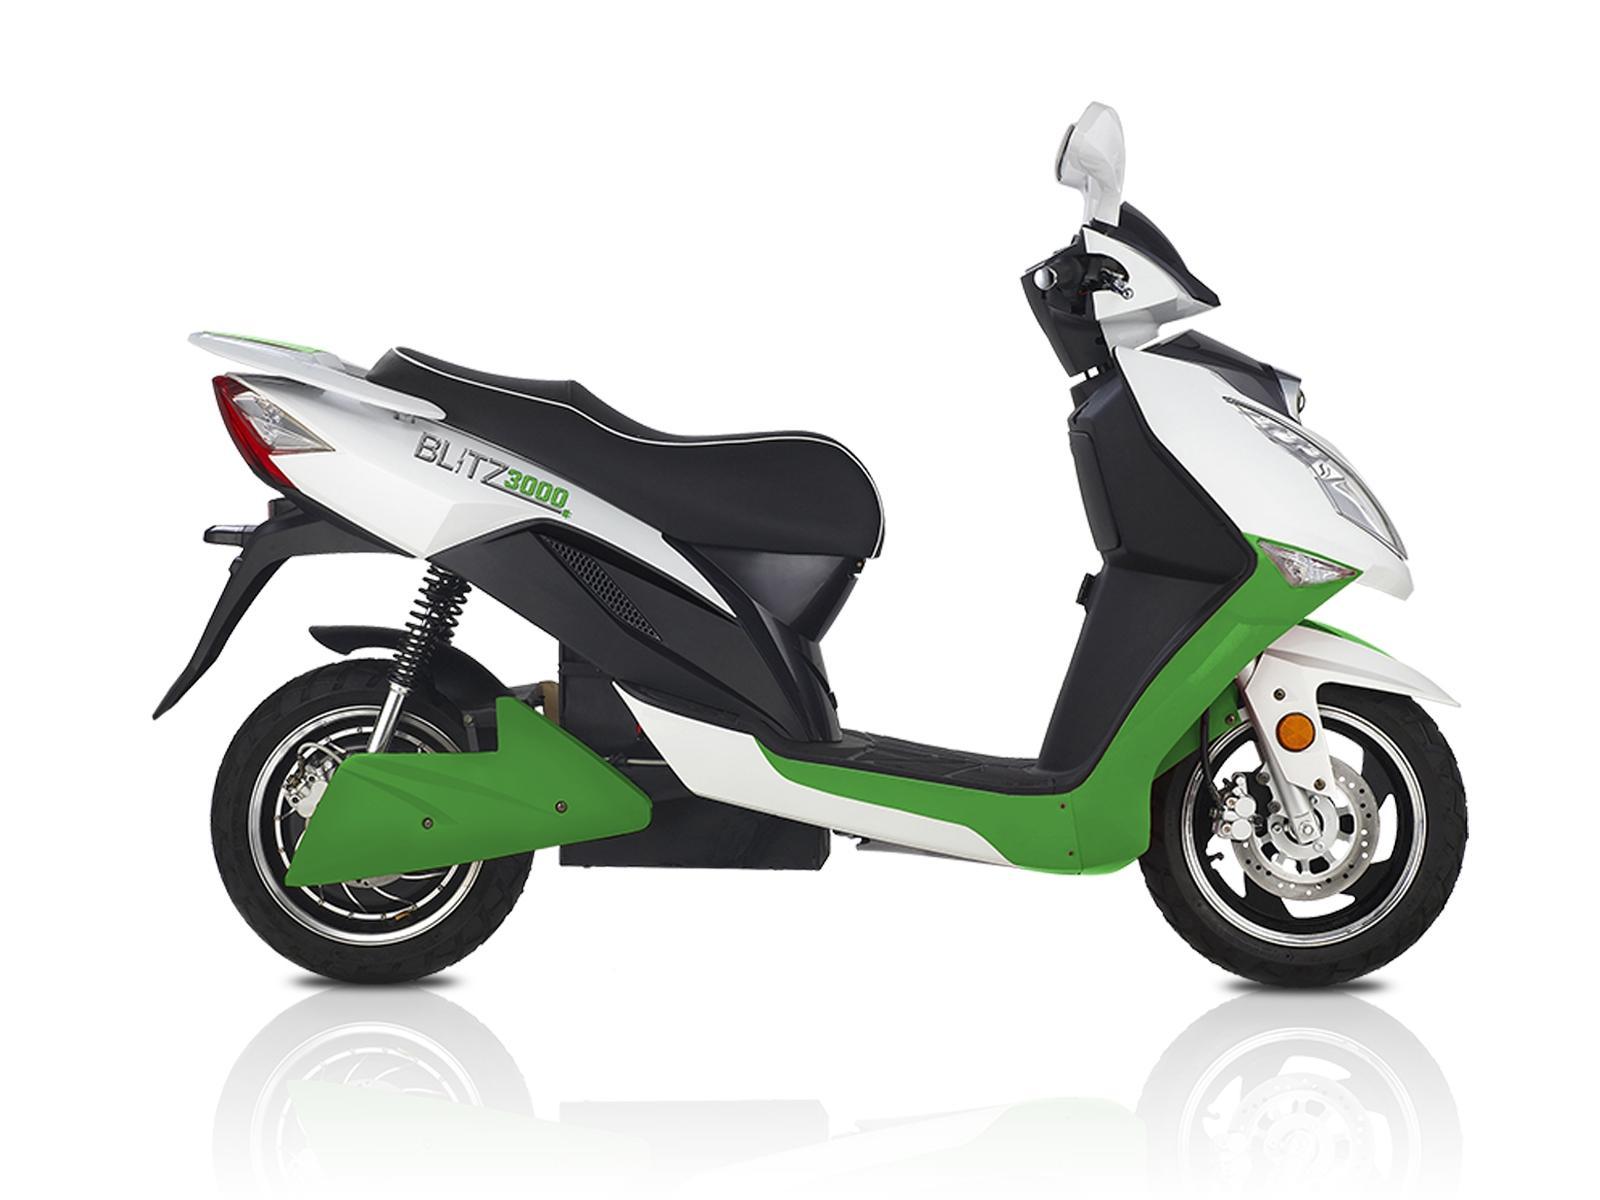 Blitz משיקה את Blitz 3000+ שדרוג לדגם האורבאני של החברה